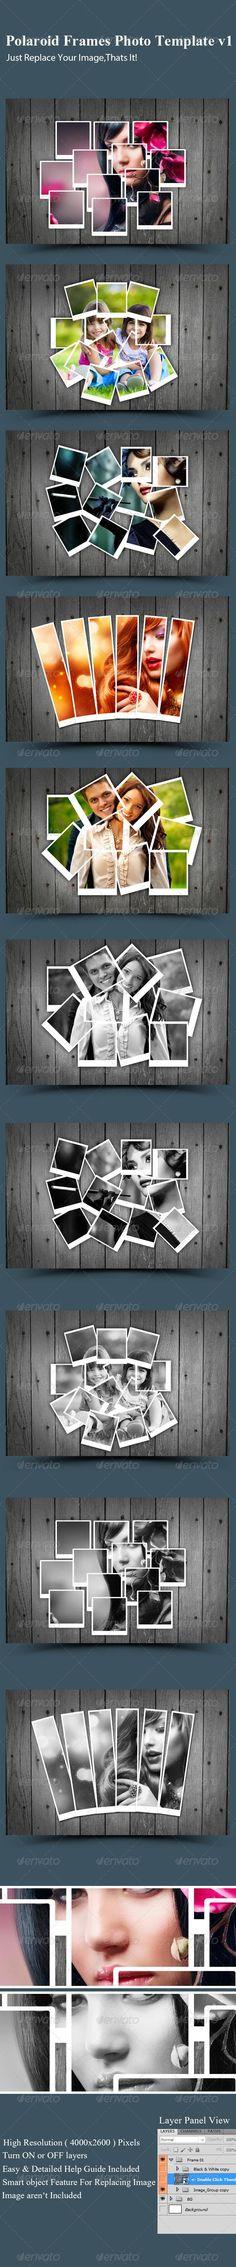 PSD - Polaroid Collage Photo Template lost photos Pinterest - polaroid template